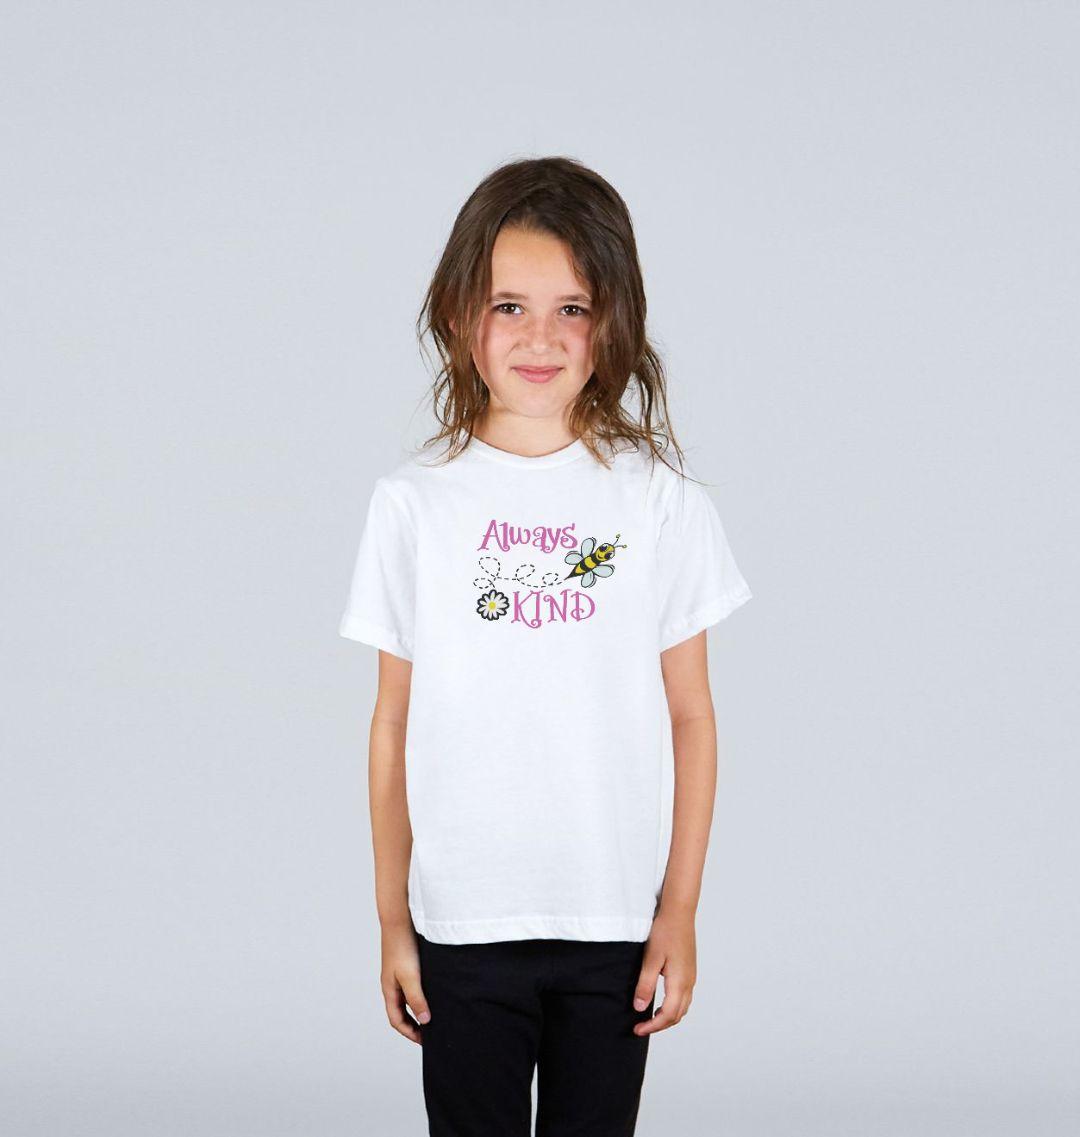 'Always Be Kind' Children's T Shirt - Soft Organic Cotton white